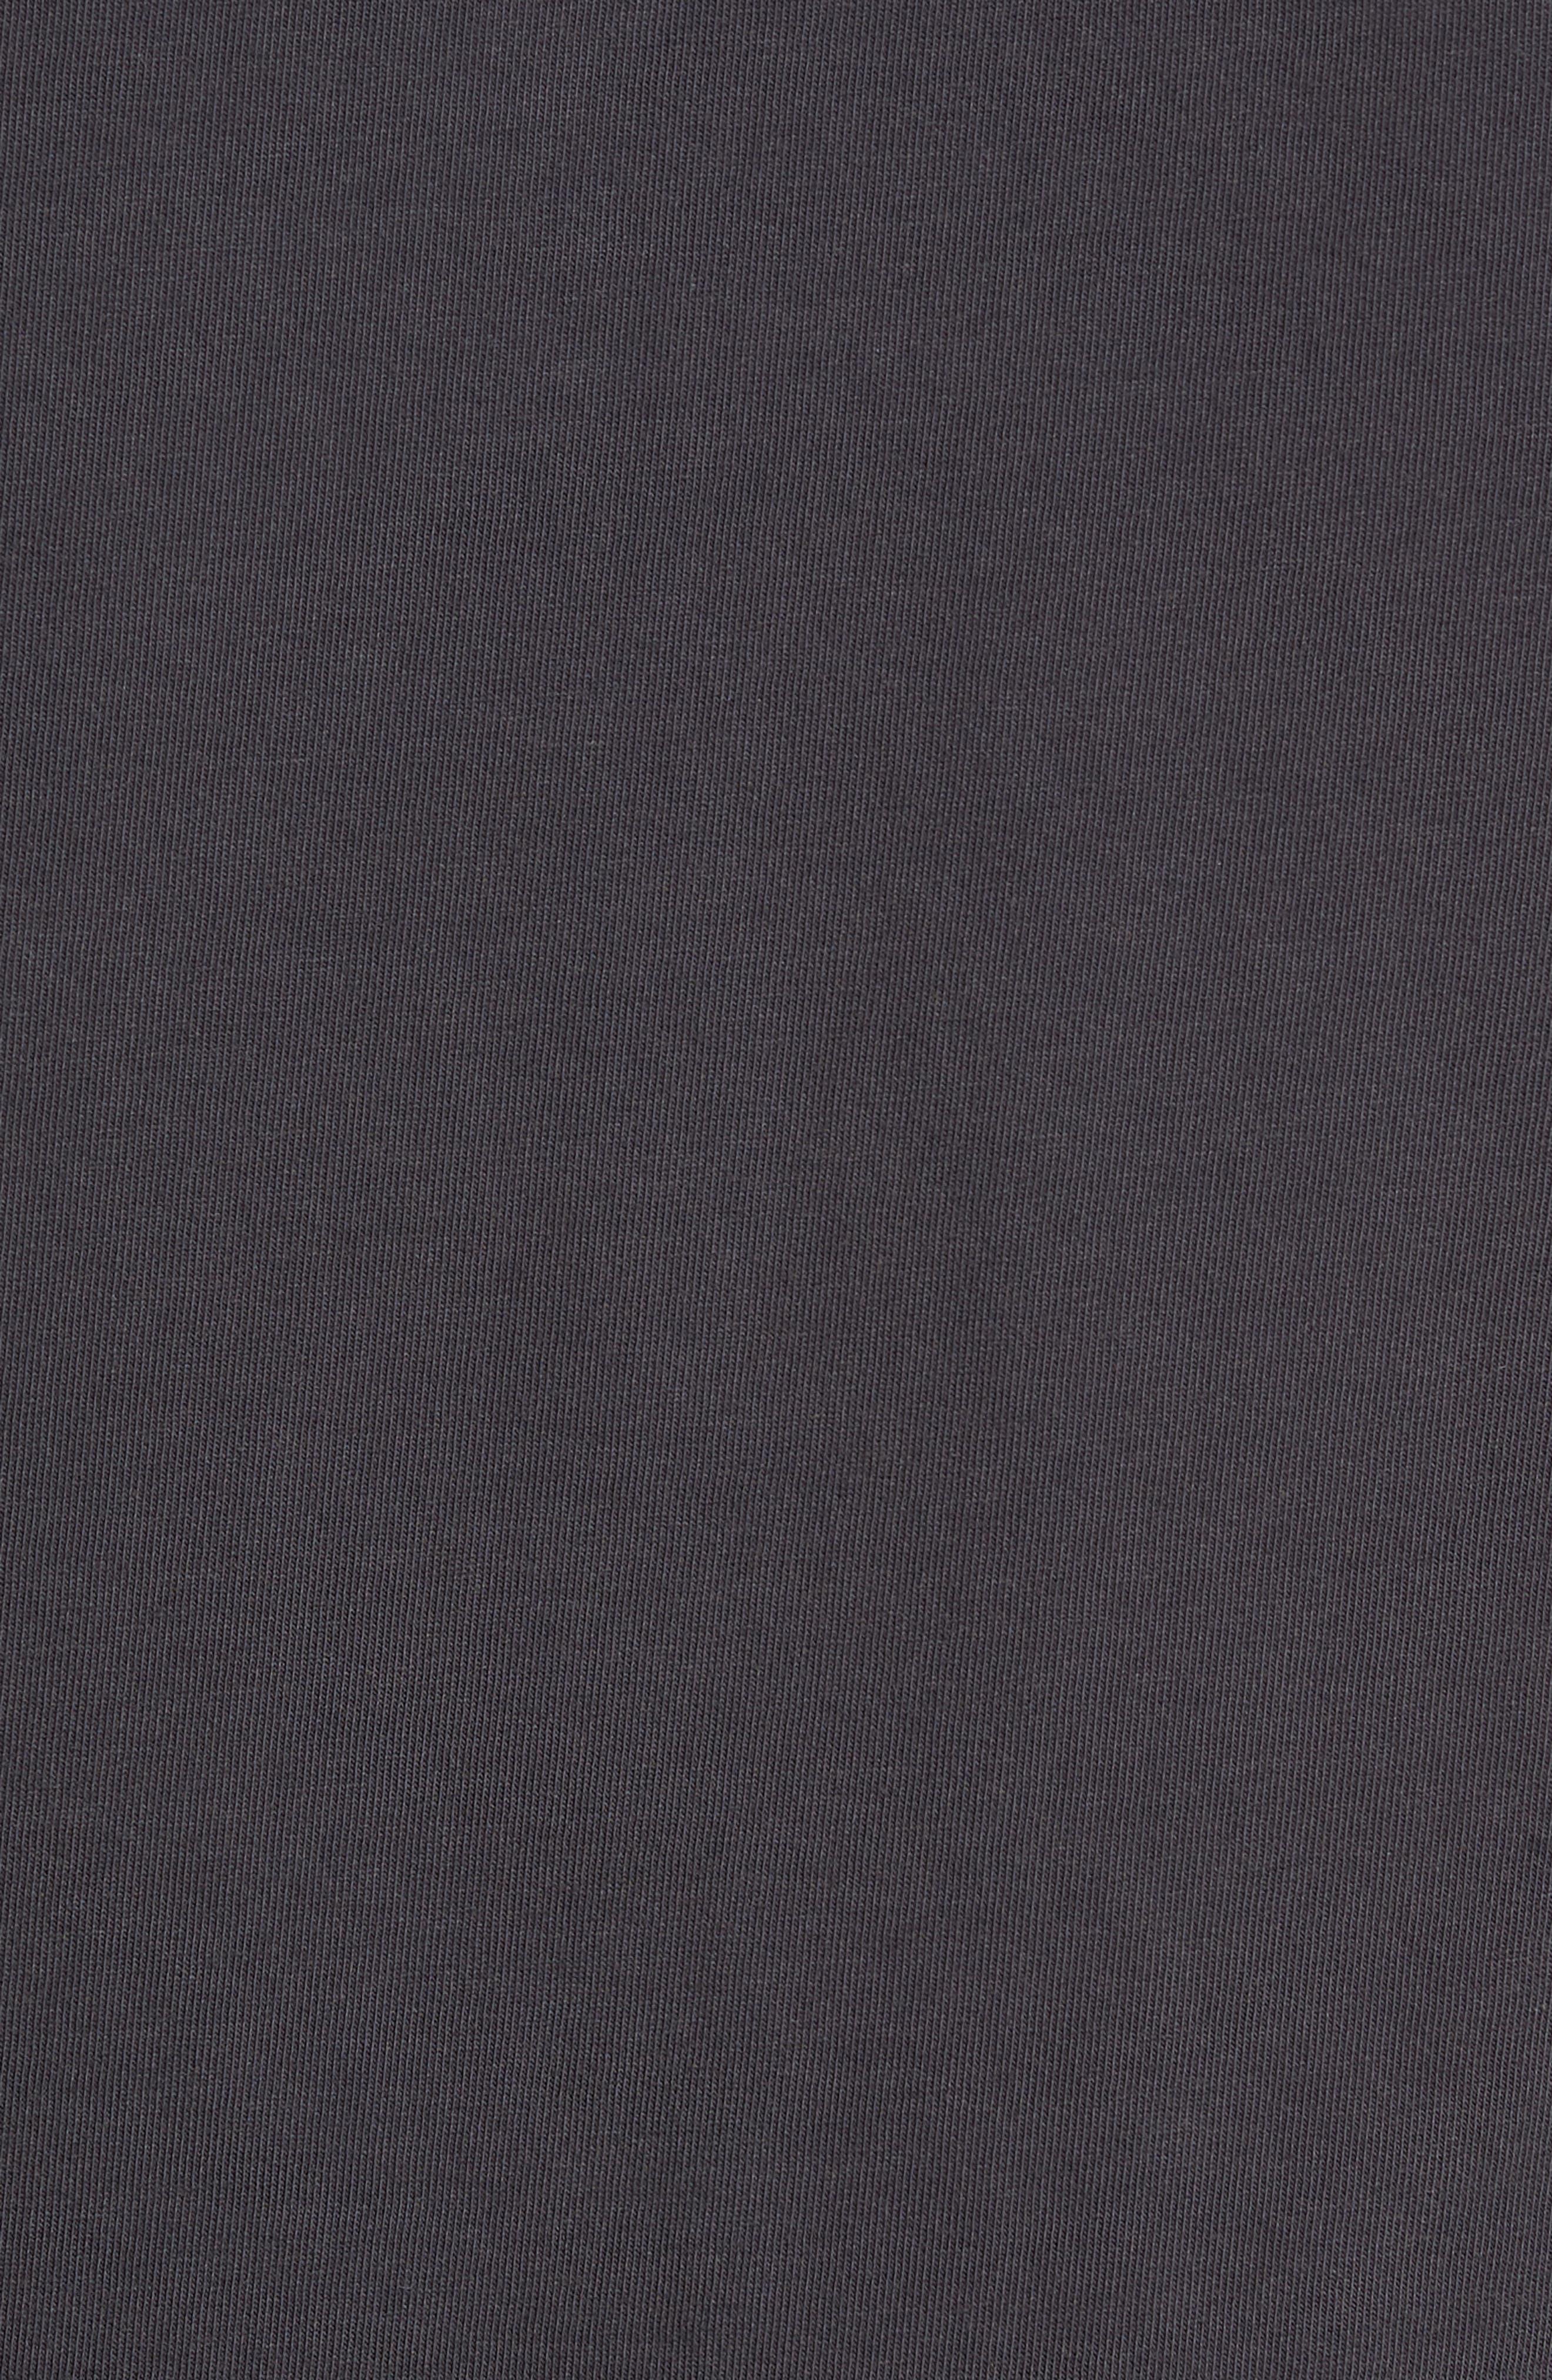 Regular Fit Garment Dye Short Sleeve Henley,                             Alternate thumbnail 5, color,                             WASHED BLACK